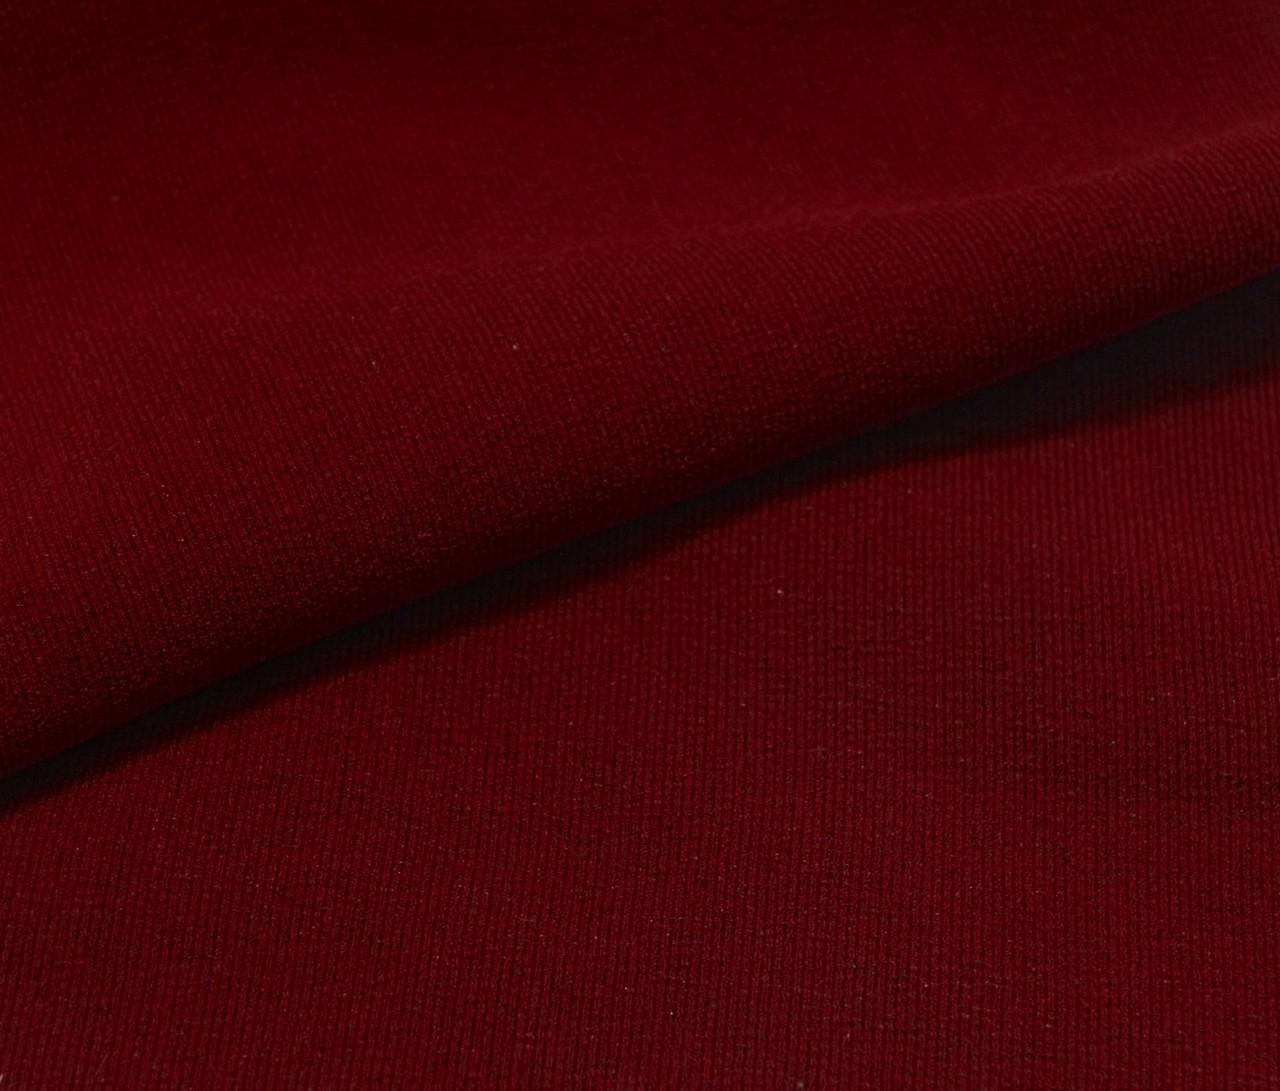 Костюмная ткань трикотажная